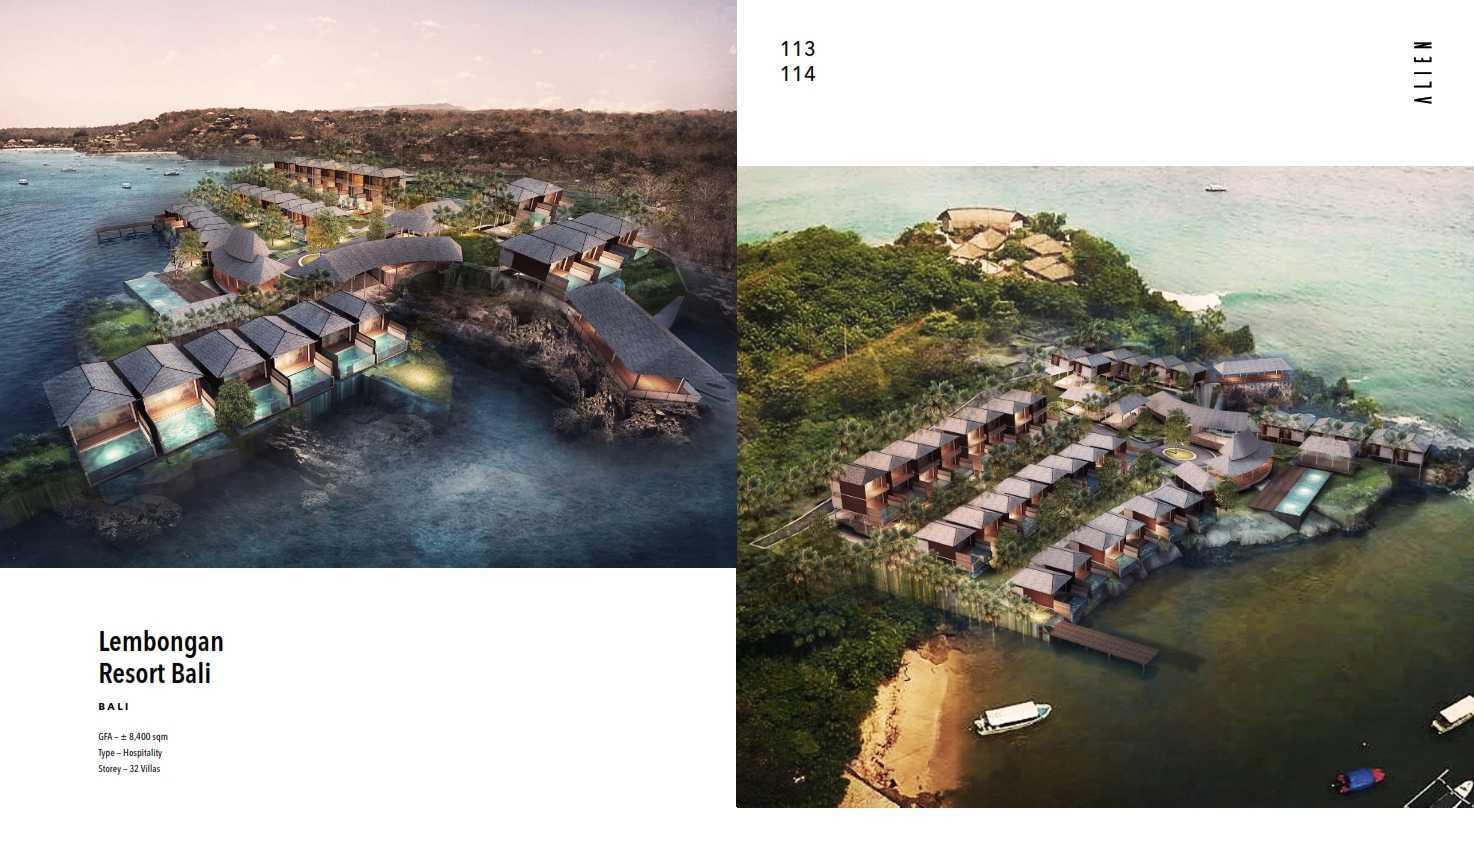 Alien Design Consultant Alien Dc Hotels & Resort Porto Palembang Palembang Aliencompro260Mmx300Mm12Updated057  44725